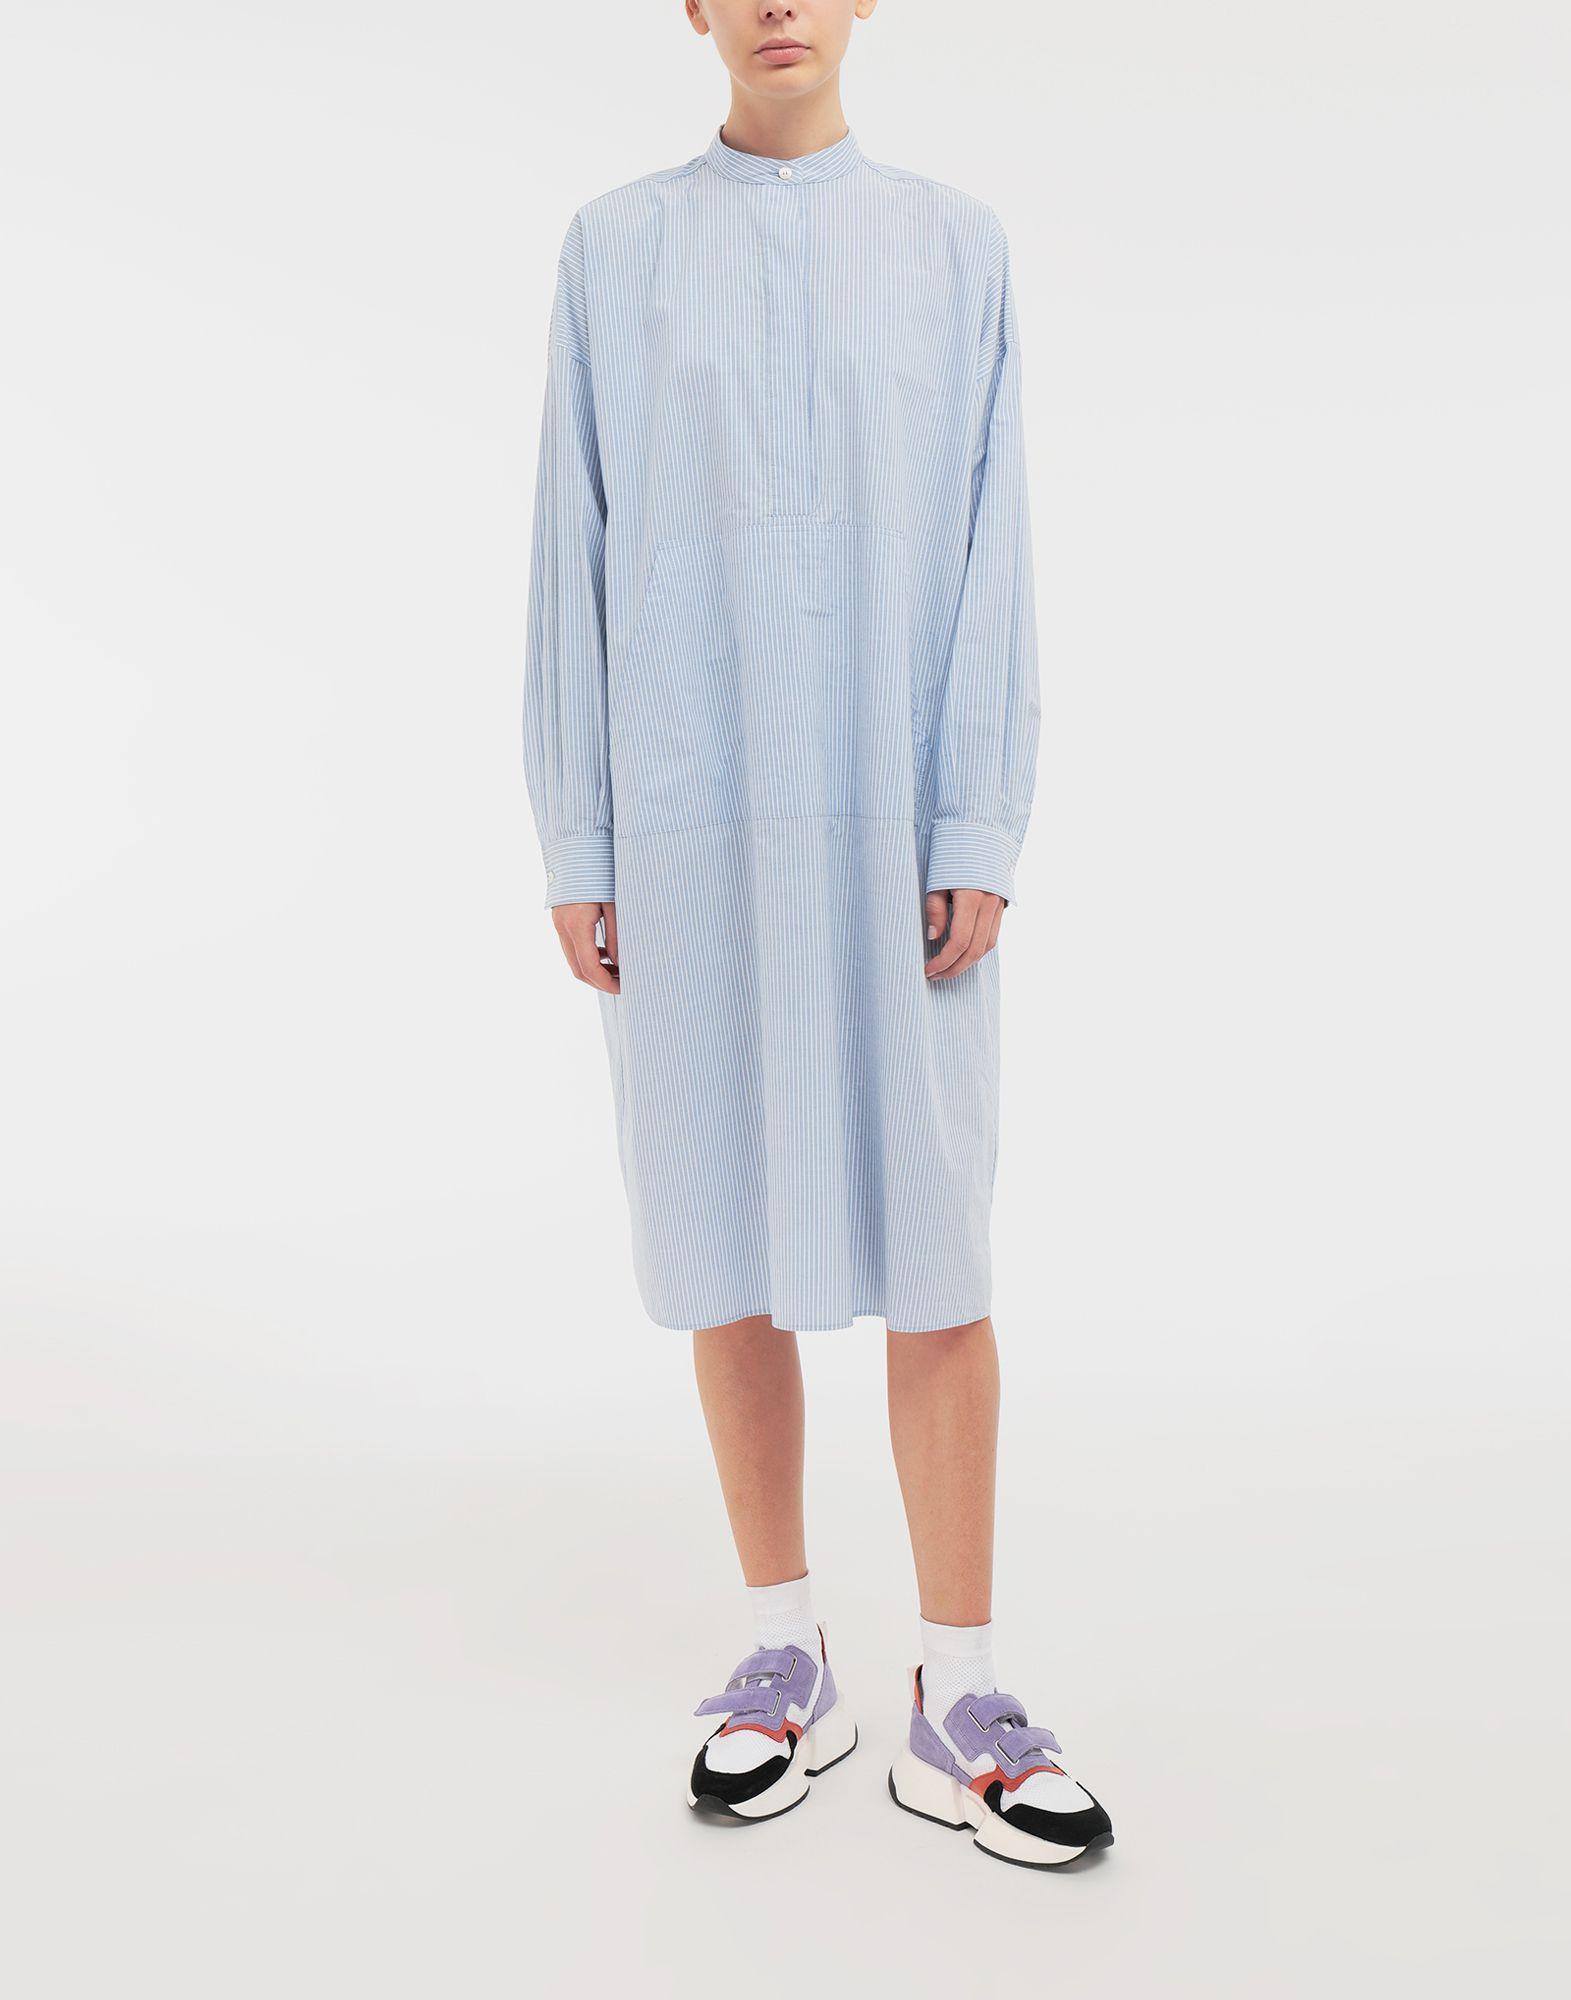 MM6 MAISON MARGIELA Logo-print poplin shirt dress Dress Woman r